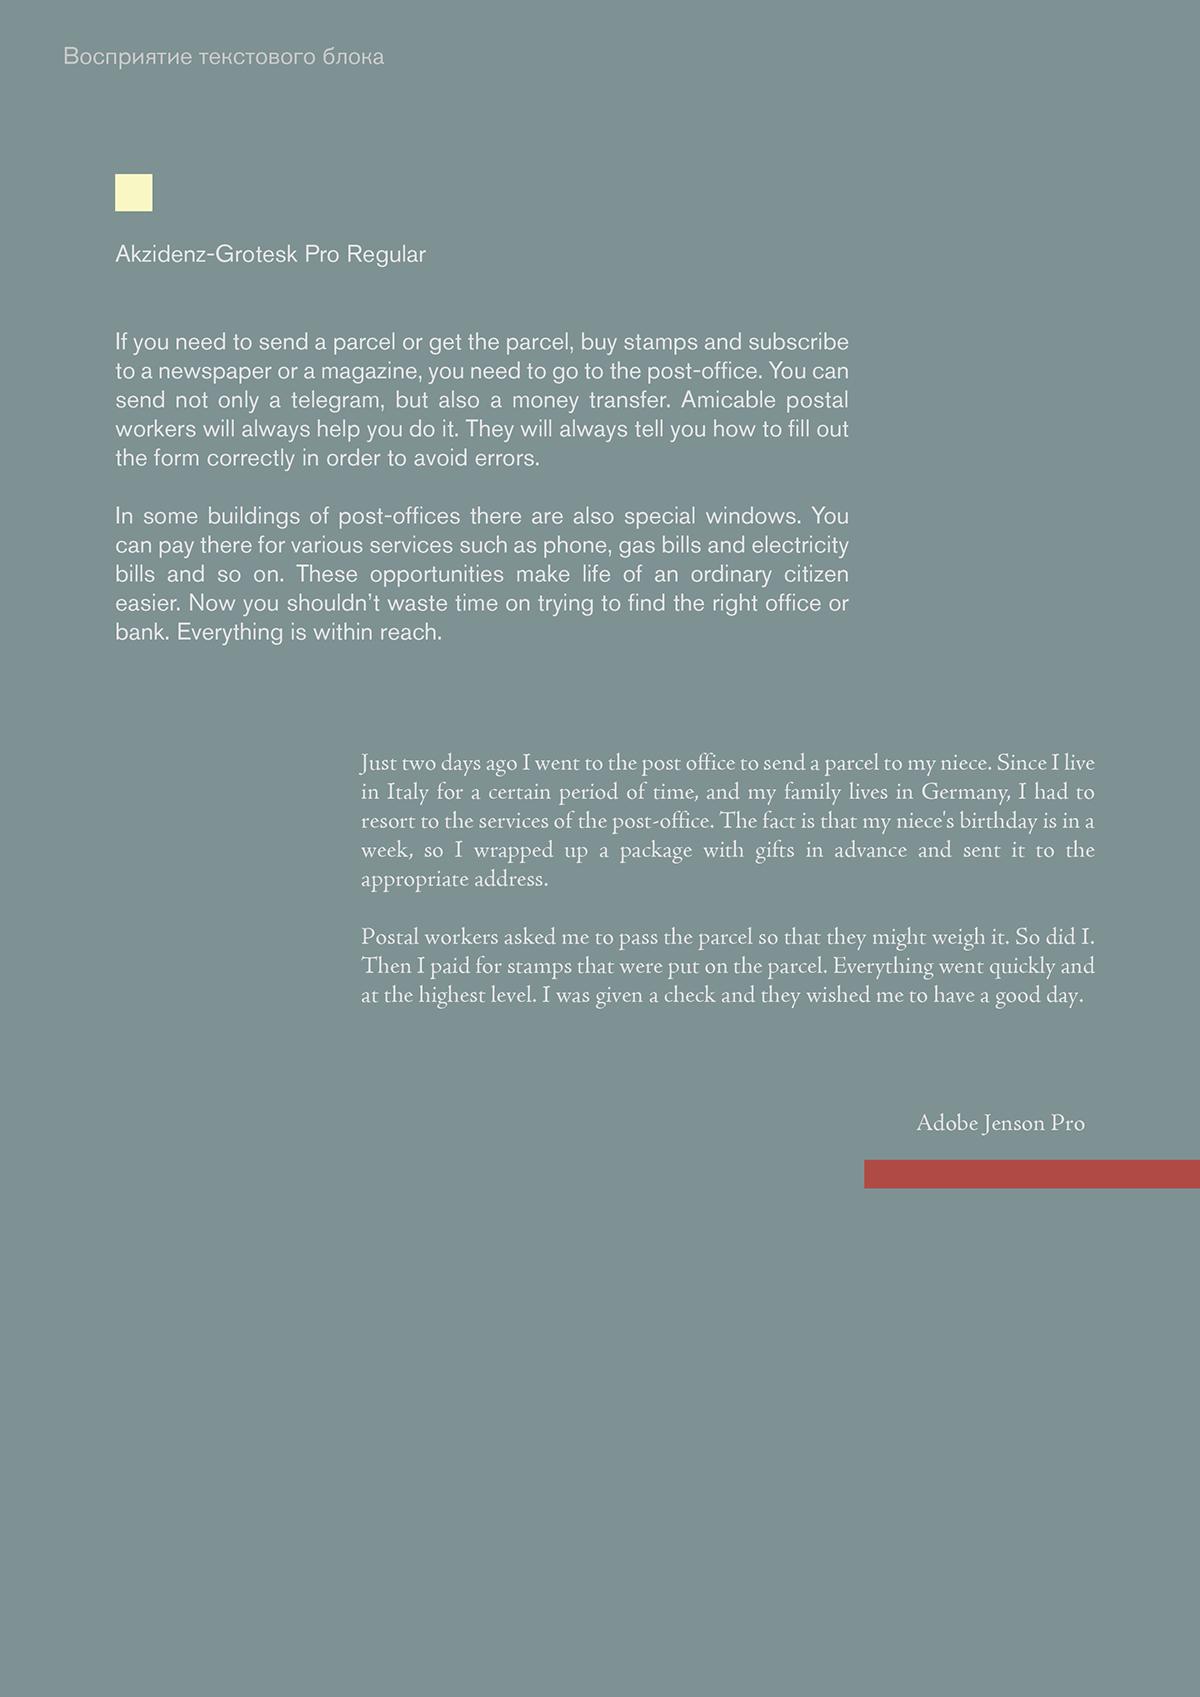 Akzidenz-Grotesk and Adobe Jenson on Behance